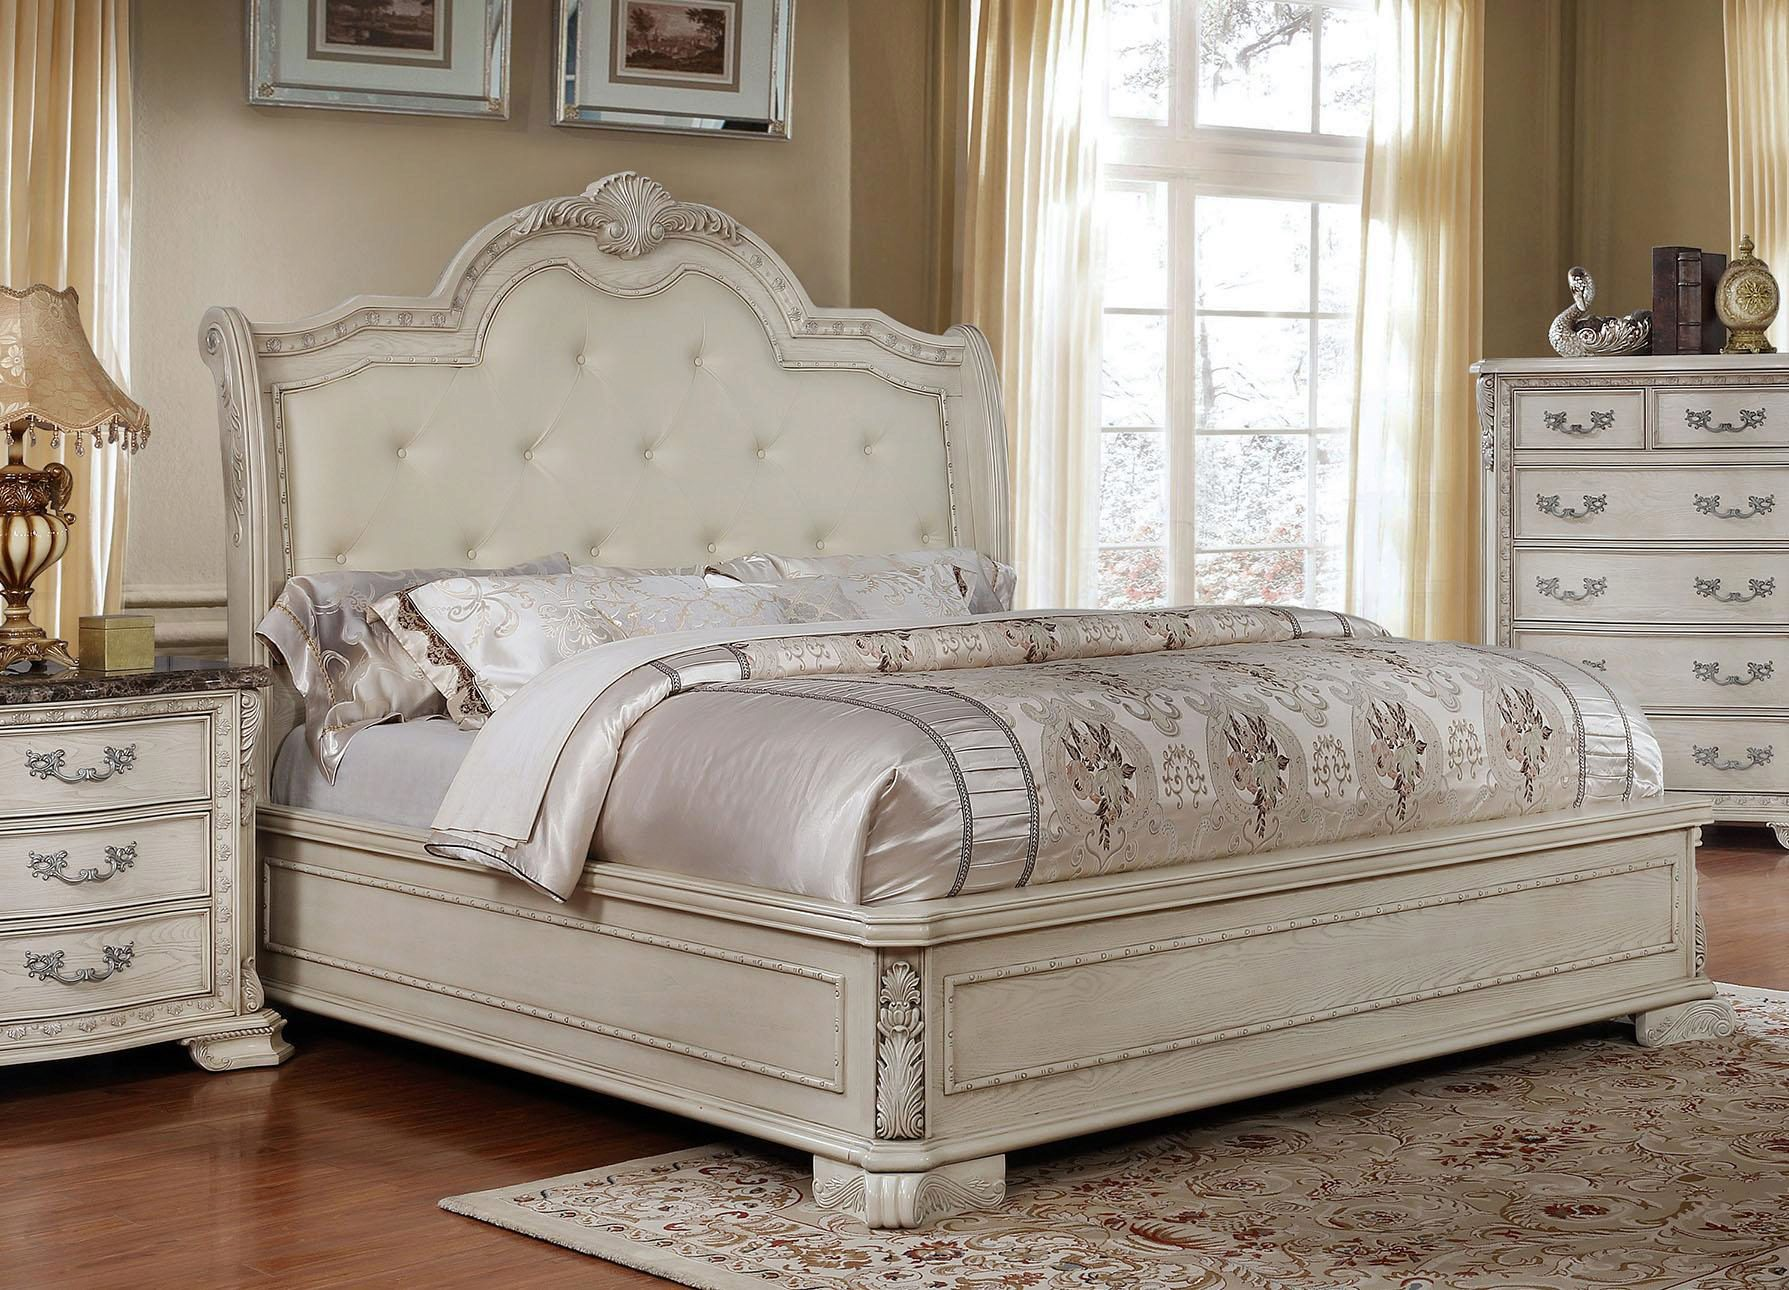 Picture of: Antique White Tufted King Size Bedroom Set 4pcs Traditional Mcferran B1000 B1000 Ek Set 4